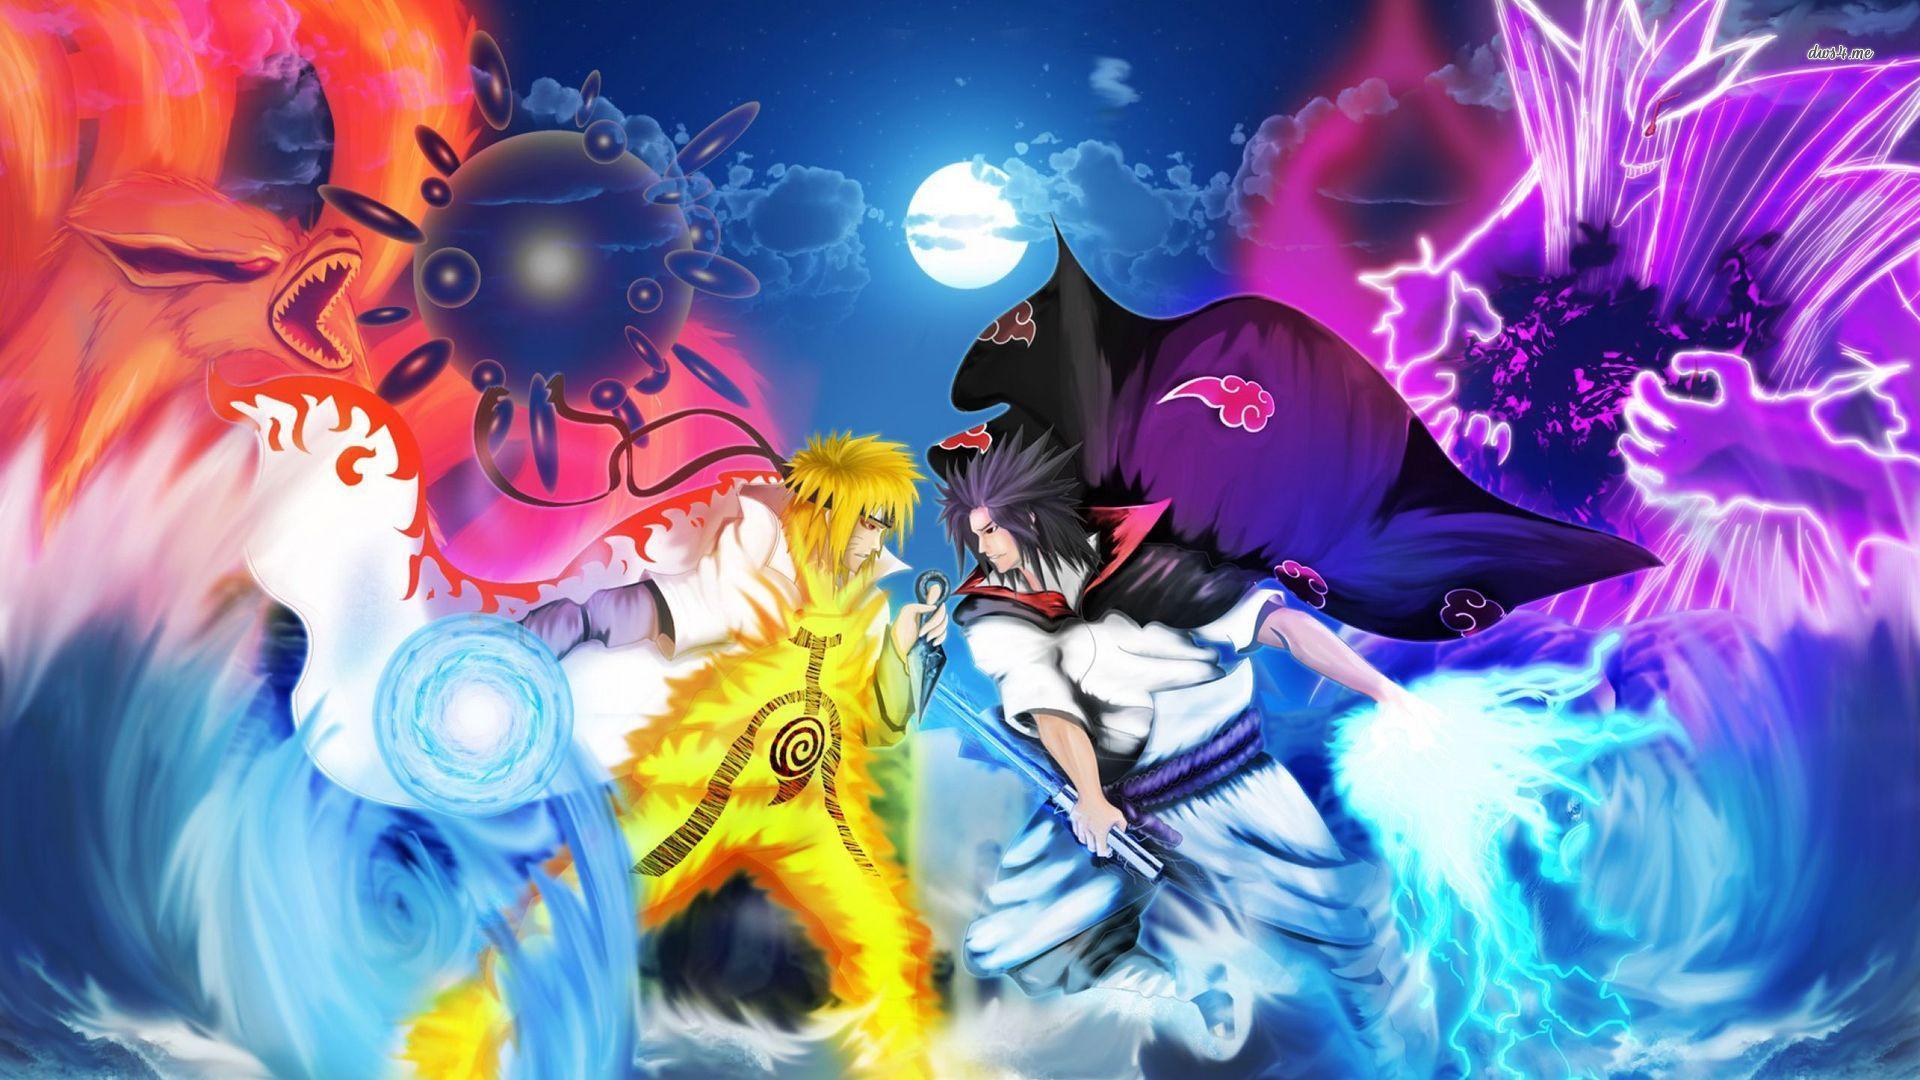 Naruto Akatsuki Naruto And Sasuke Wallpaper Hd For Android